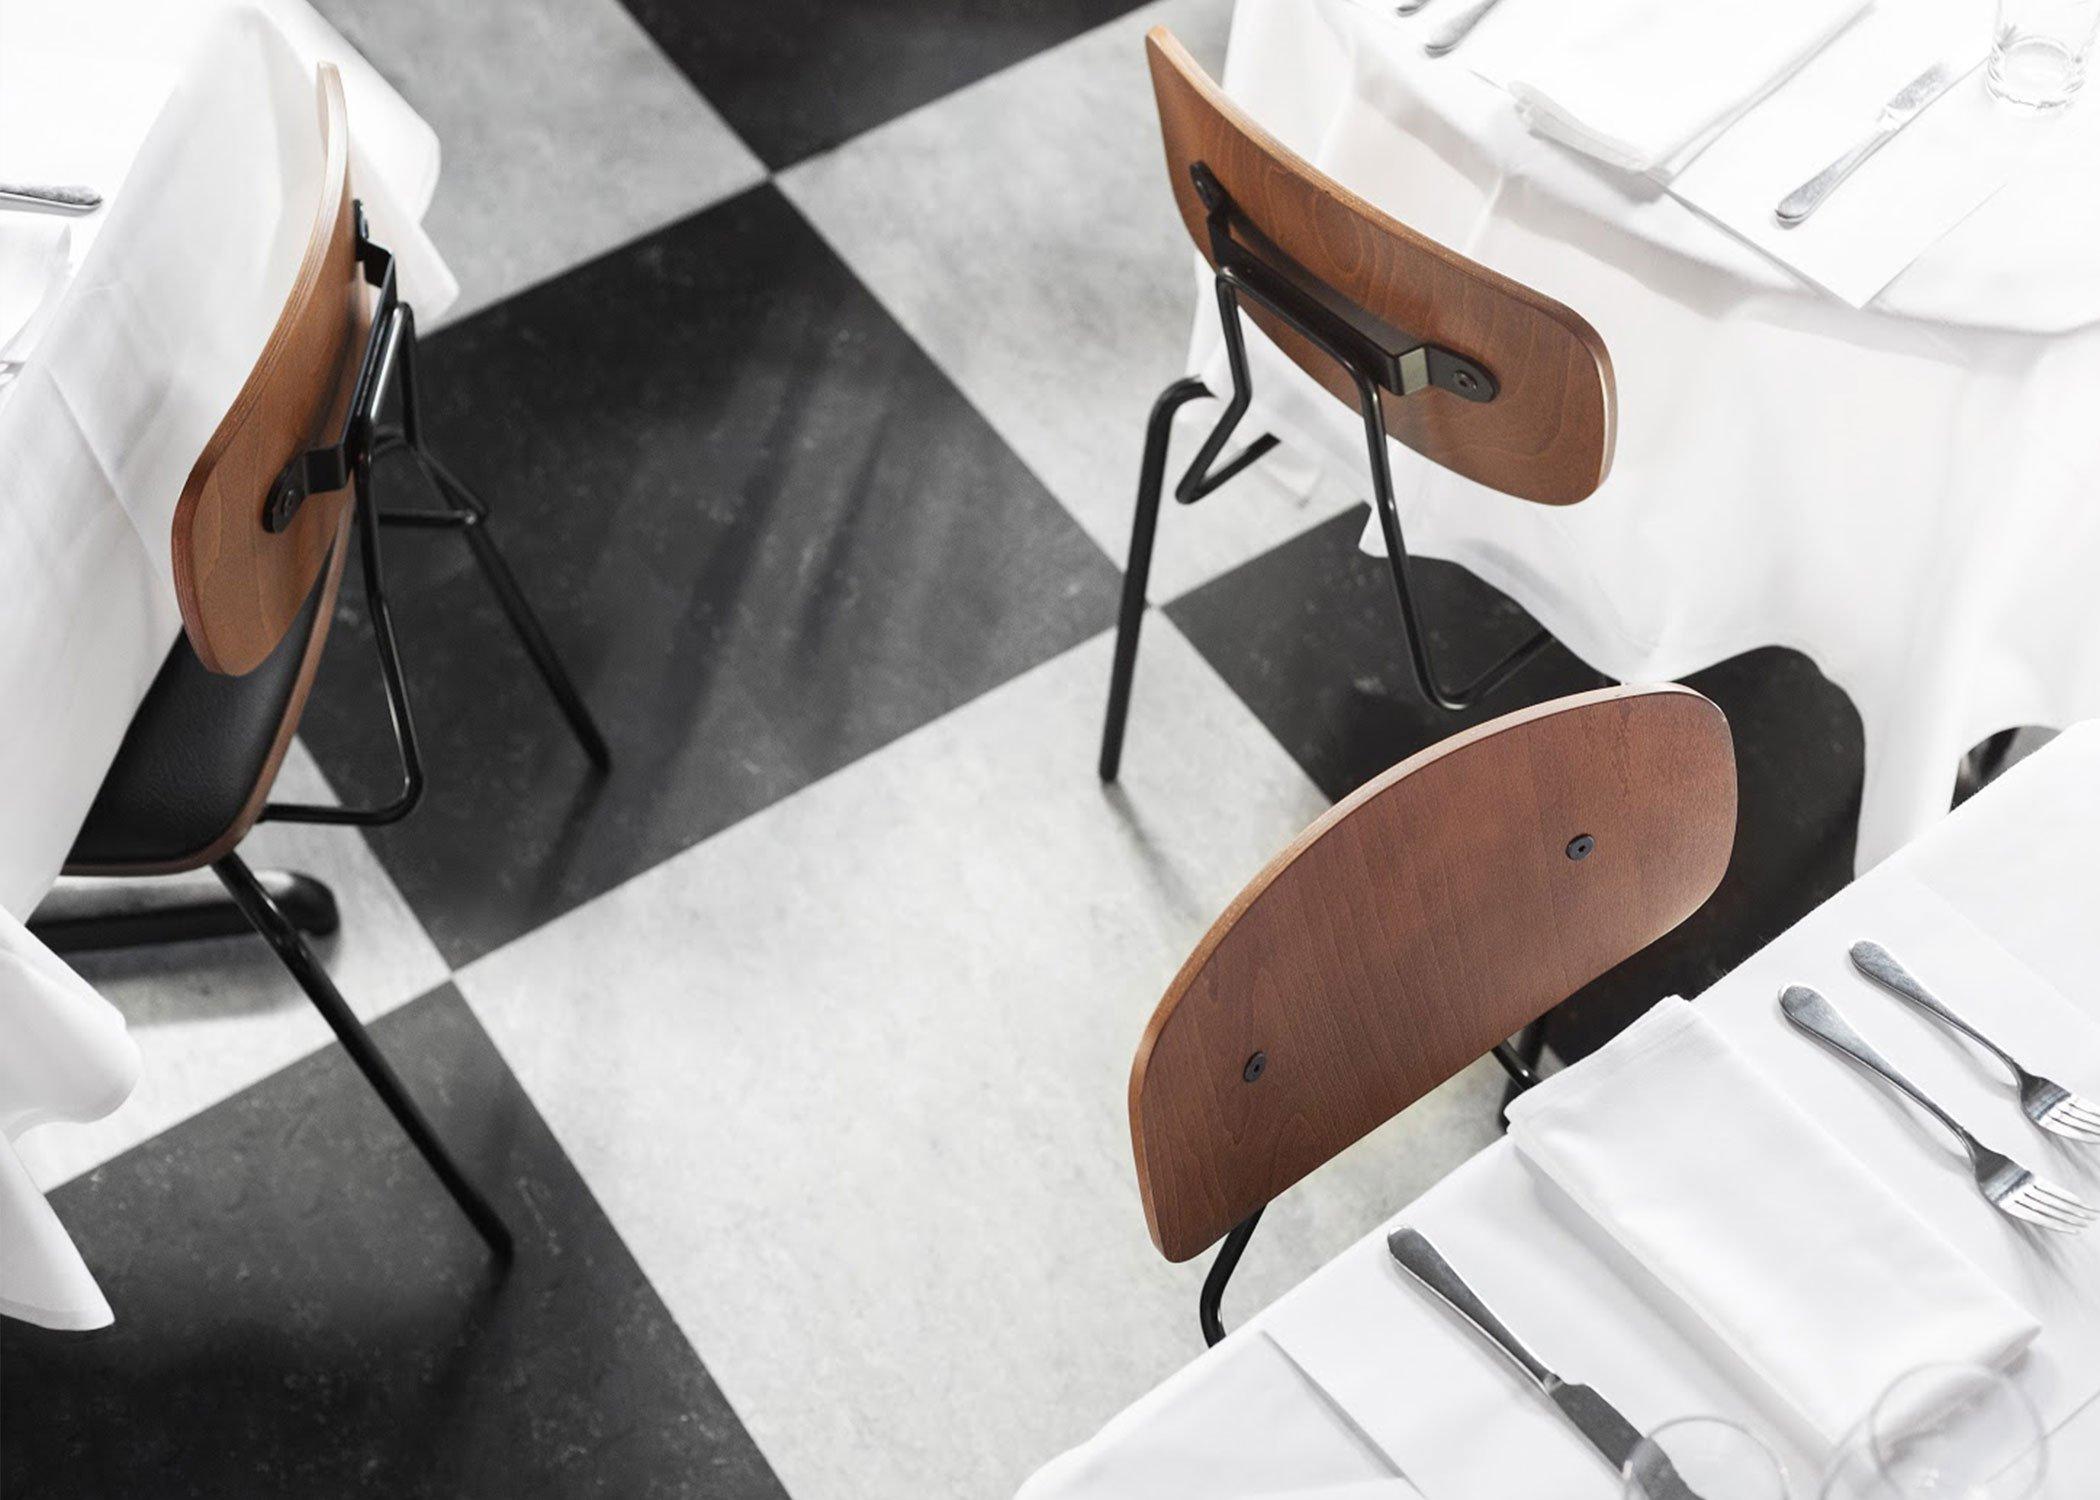 Serafina_Reece_Chair_Formal_Restaurant_Design